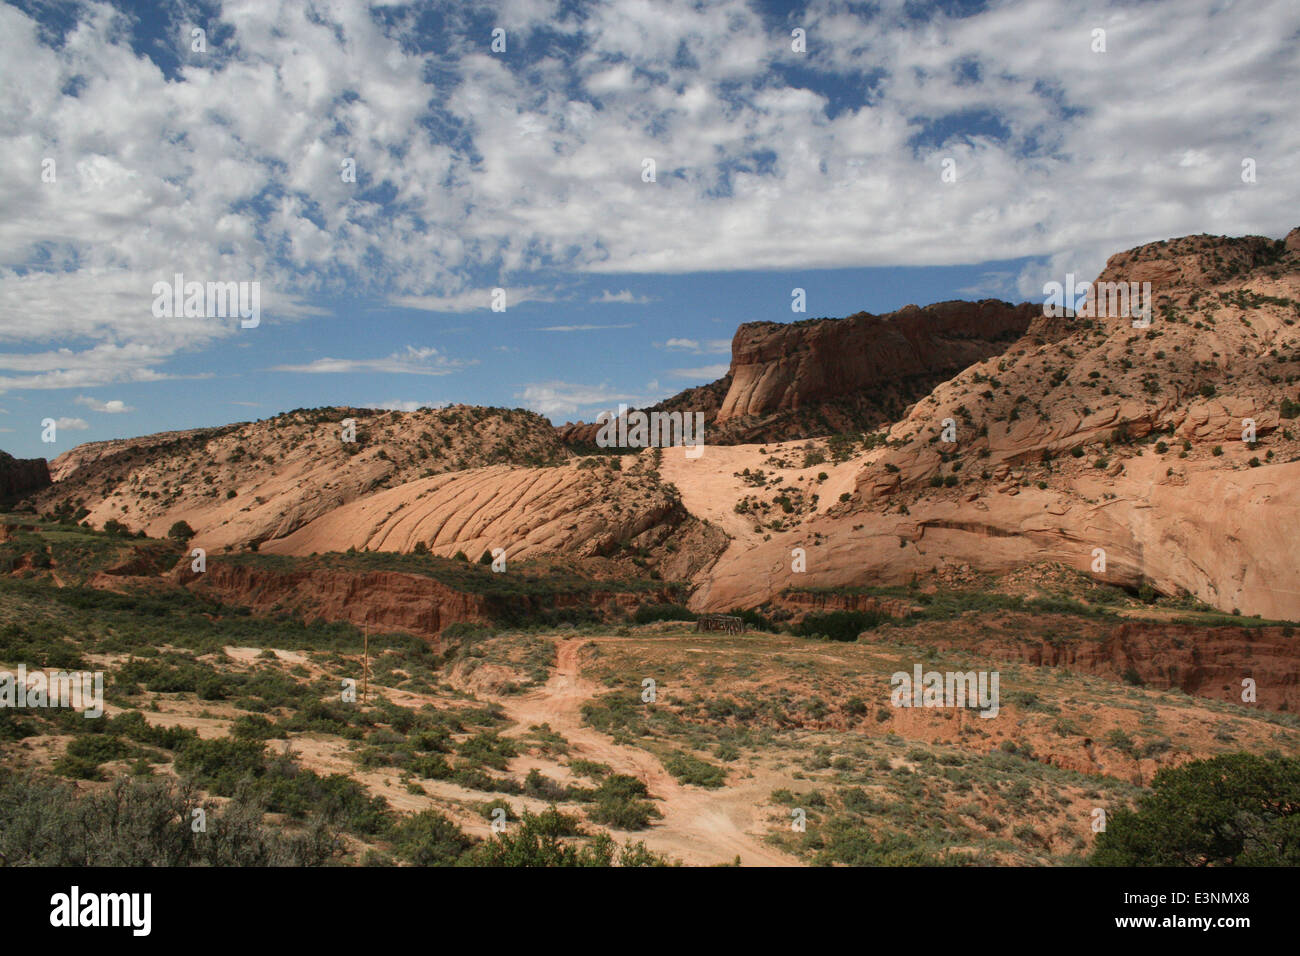 Zion Nationalpark - Stock Image